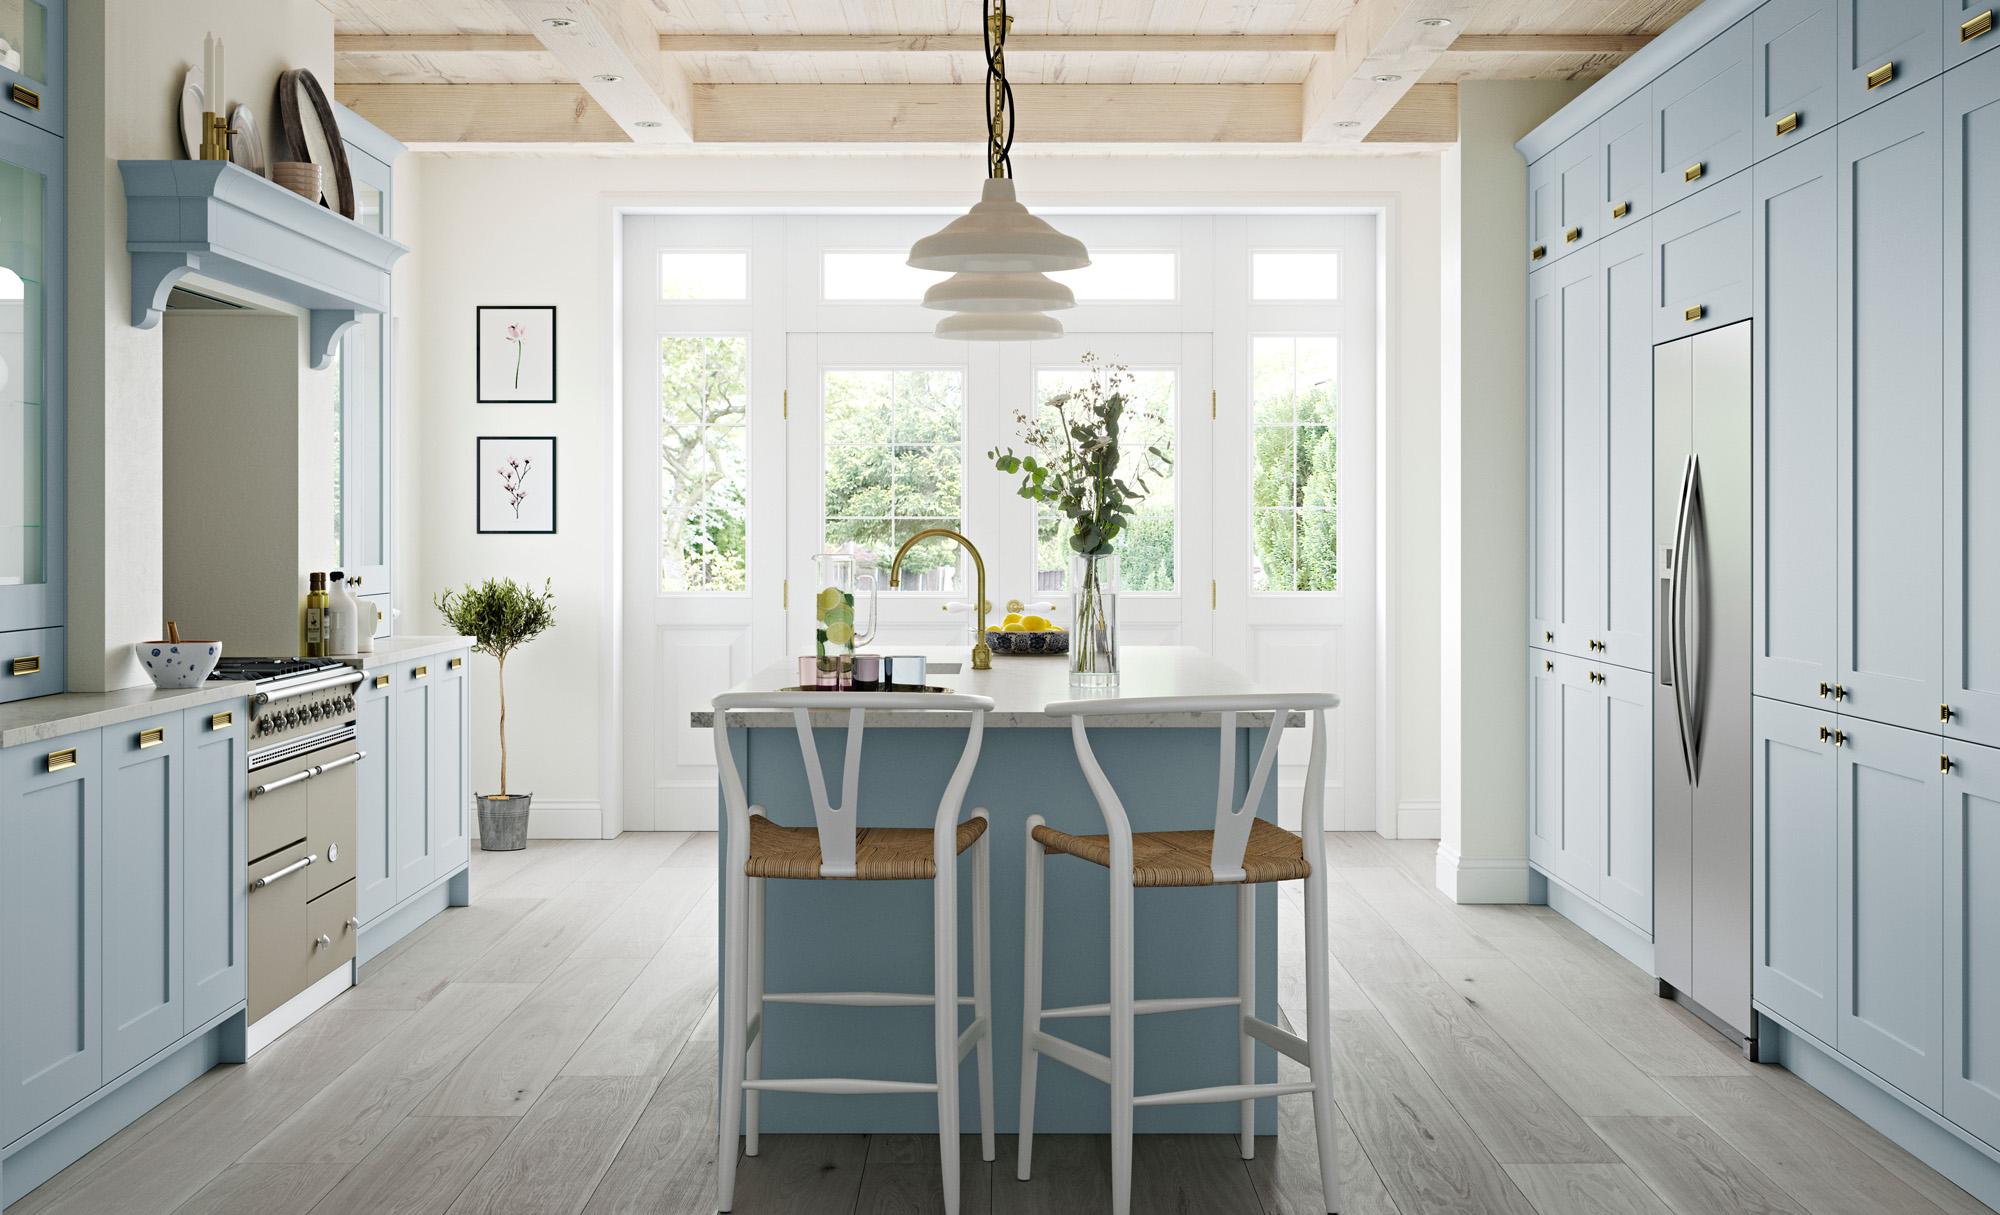 Country Classic Traditional Kitchen - Georgia Pantry Blue Kitchen - Kitchen Design - Alan Kelly Kitchens - Waterford